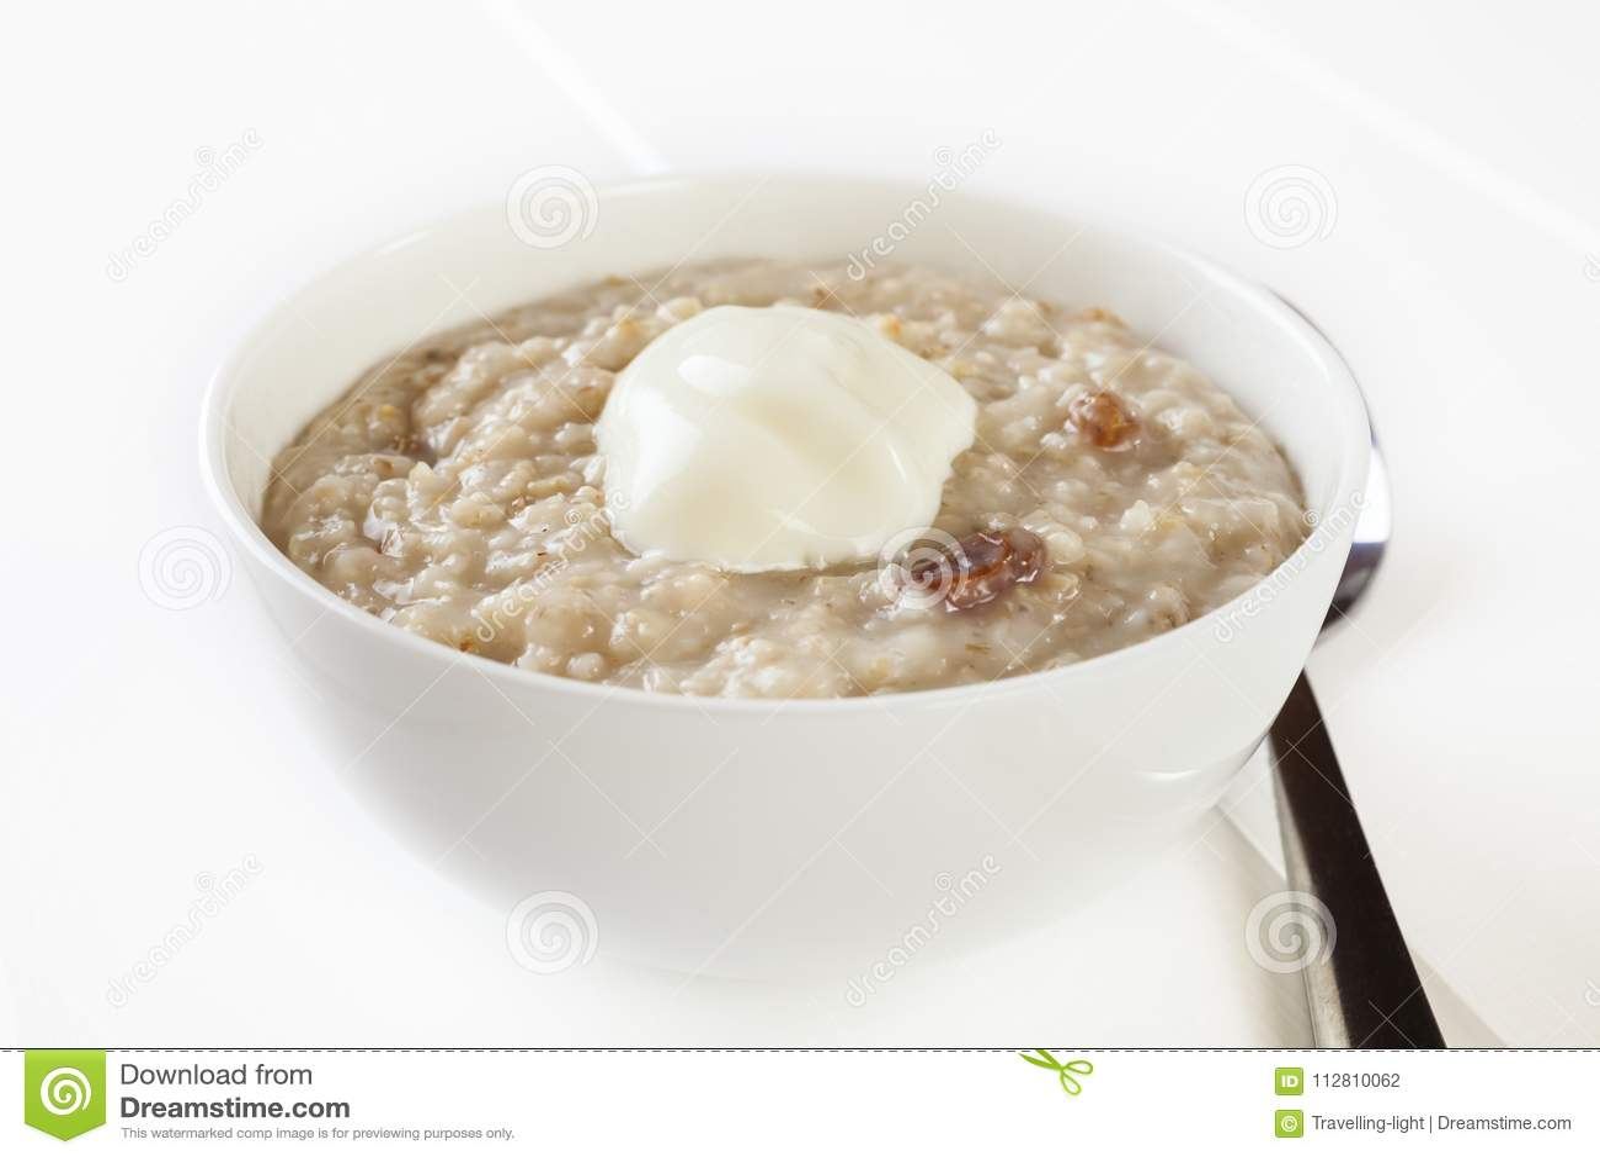 Porridge With Yoghurt Low Calorie Stock Photo Image Of Food Porridge 112810062